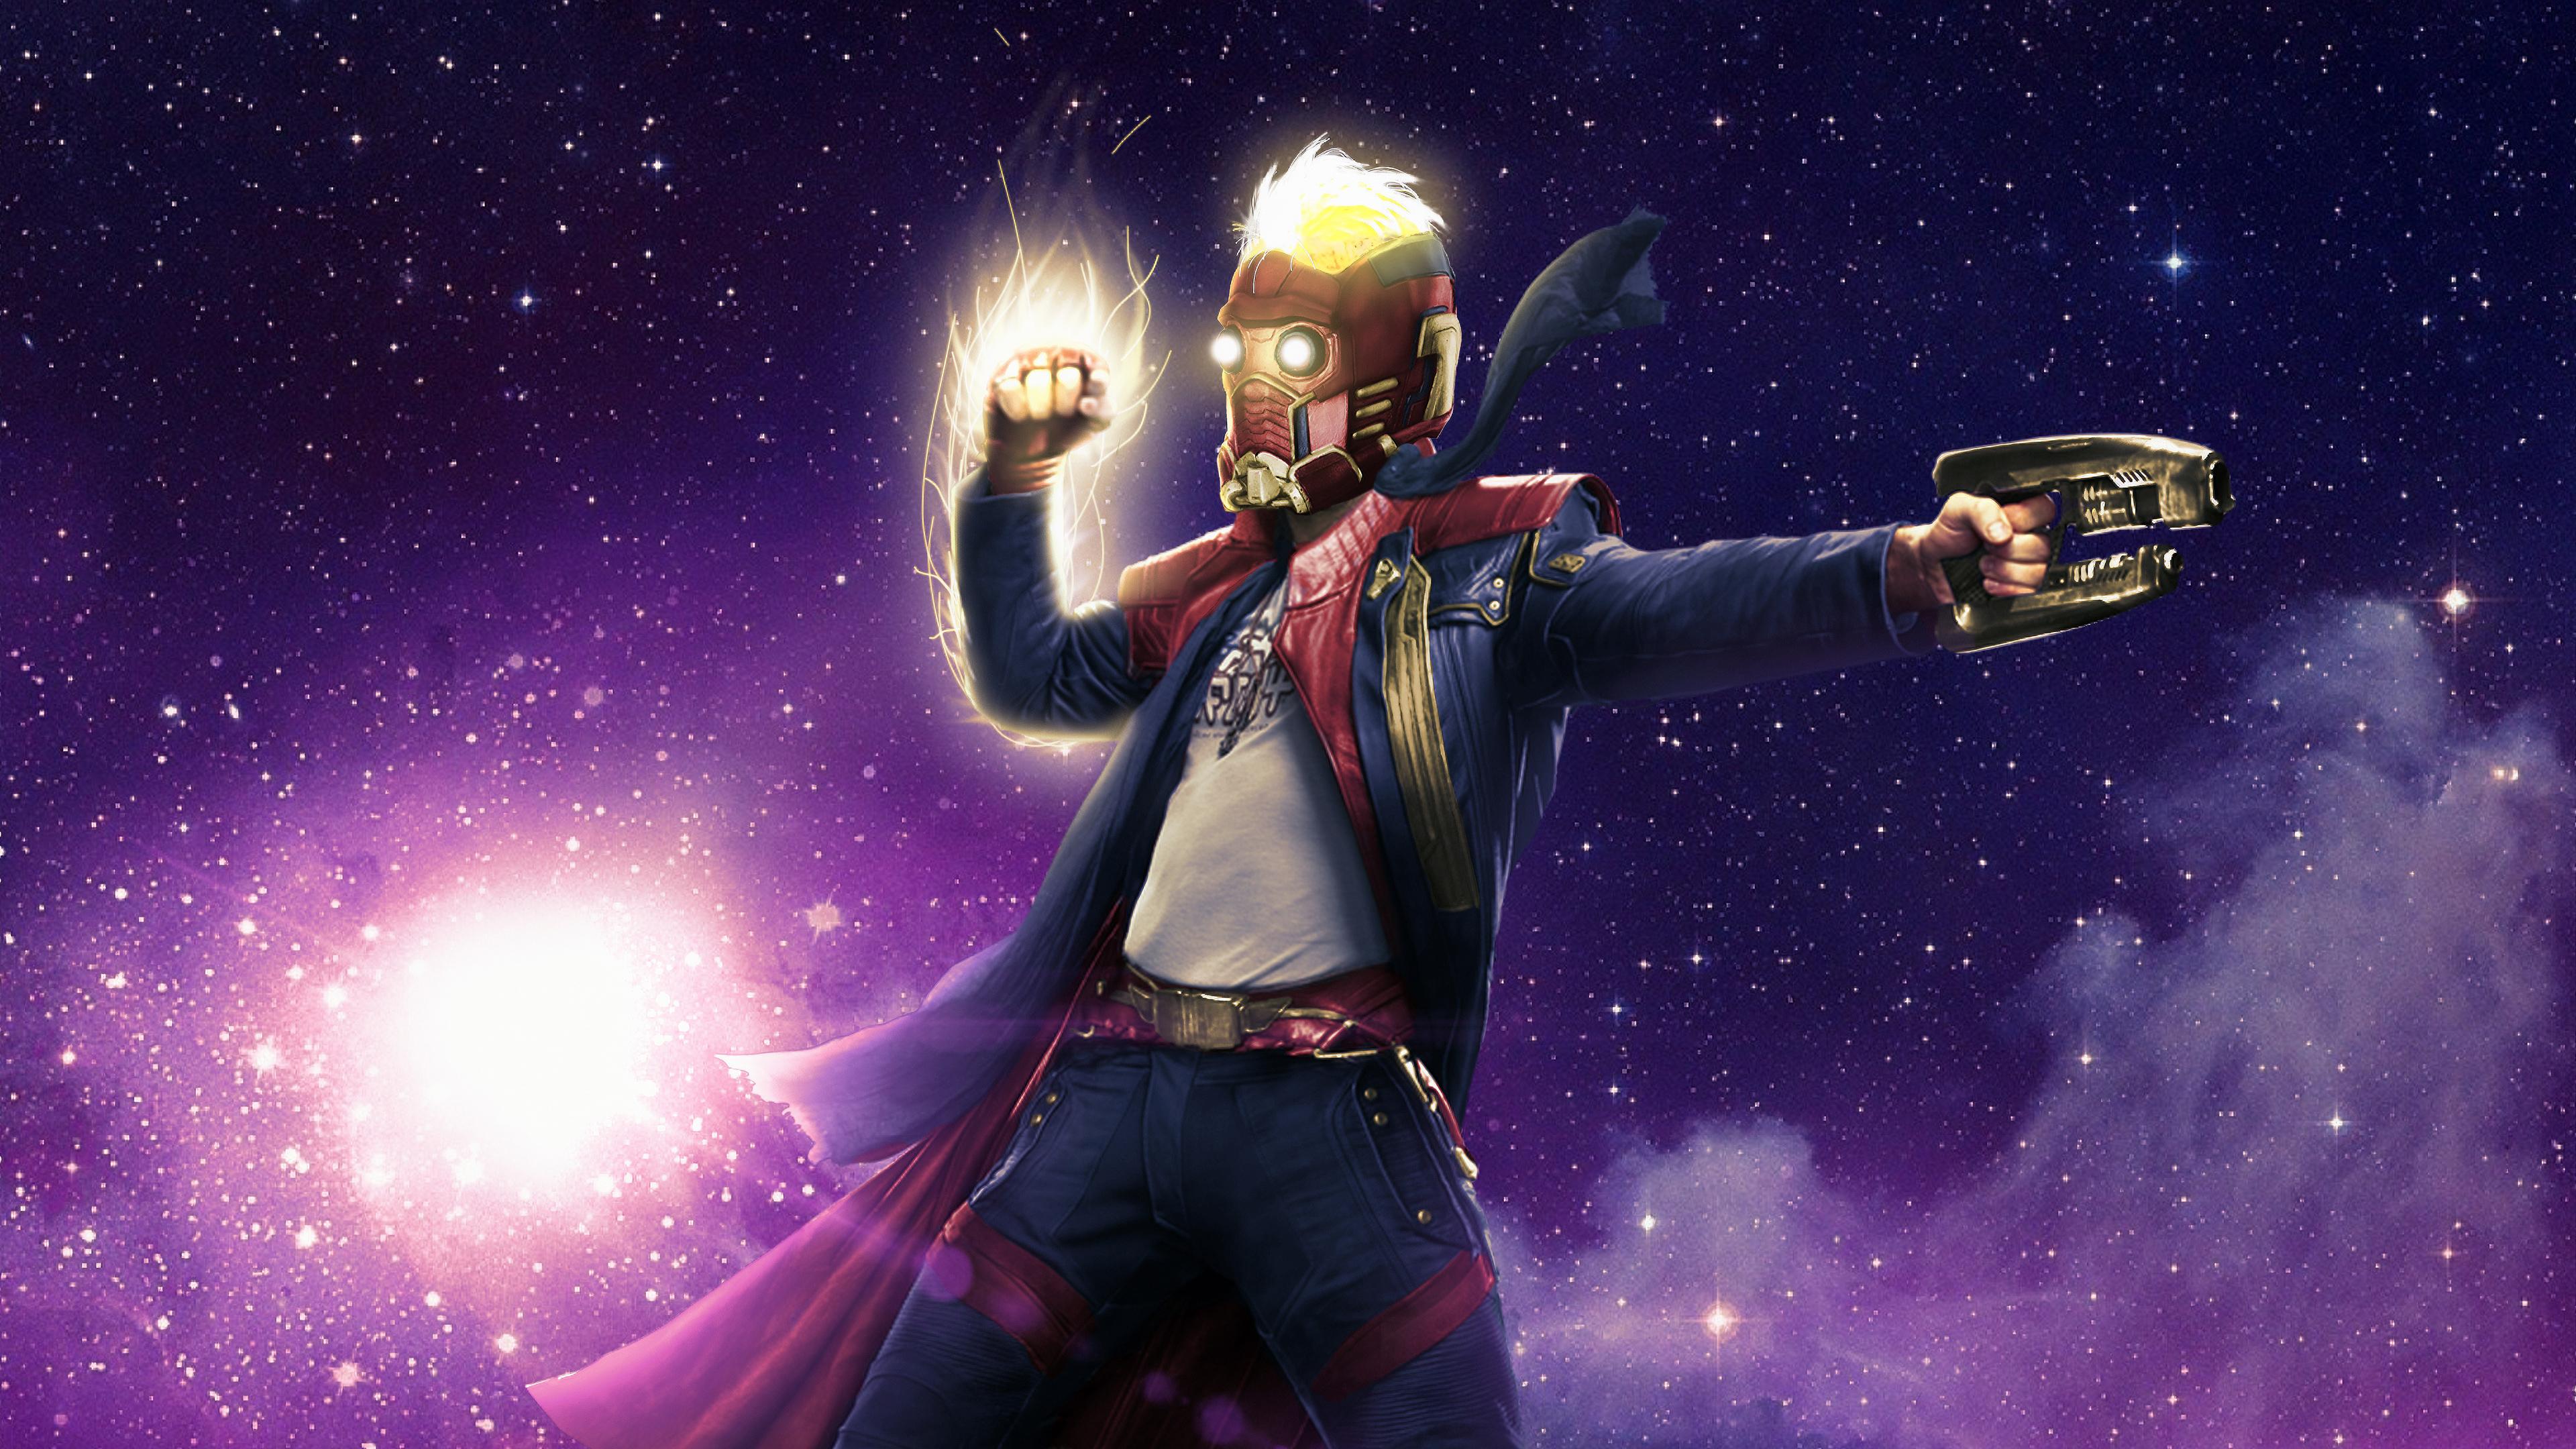 star lord captain marvel mashup 1560533554 - Star Lord Captain Marvel Mashup - superheroes wallpapers, star lord wallpapers, hd-wallpapers, captain marvel wallpapers, behance wallpapers, artist wallpapers